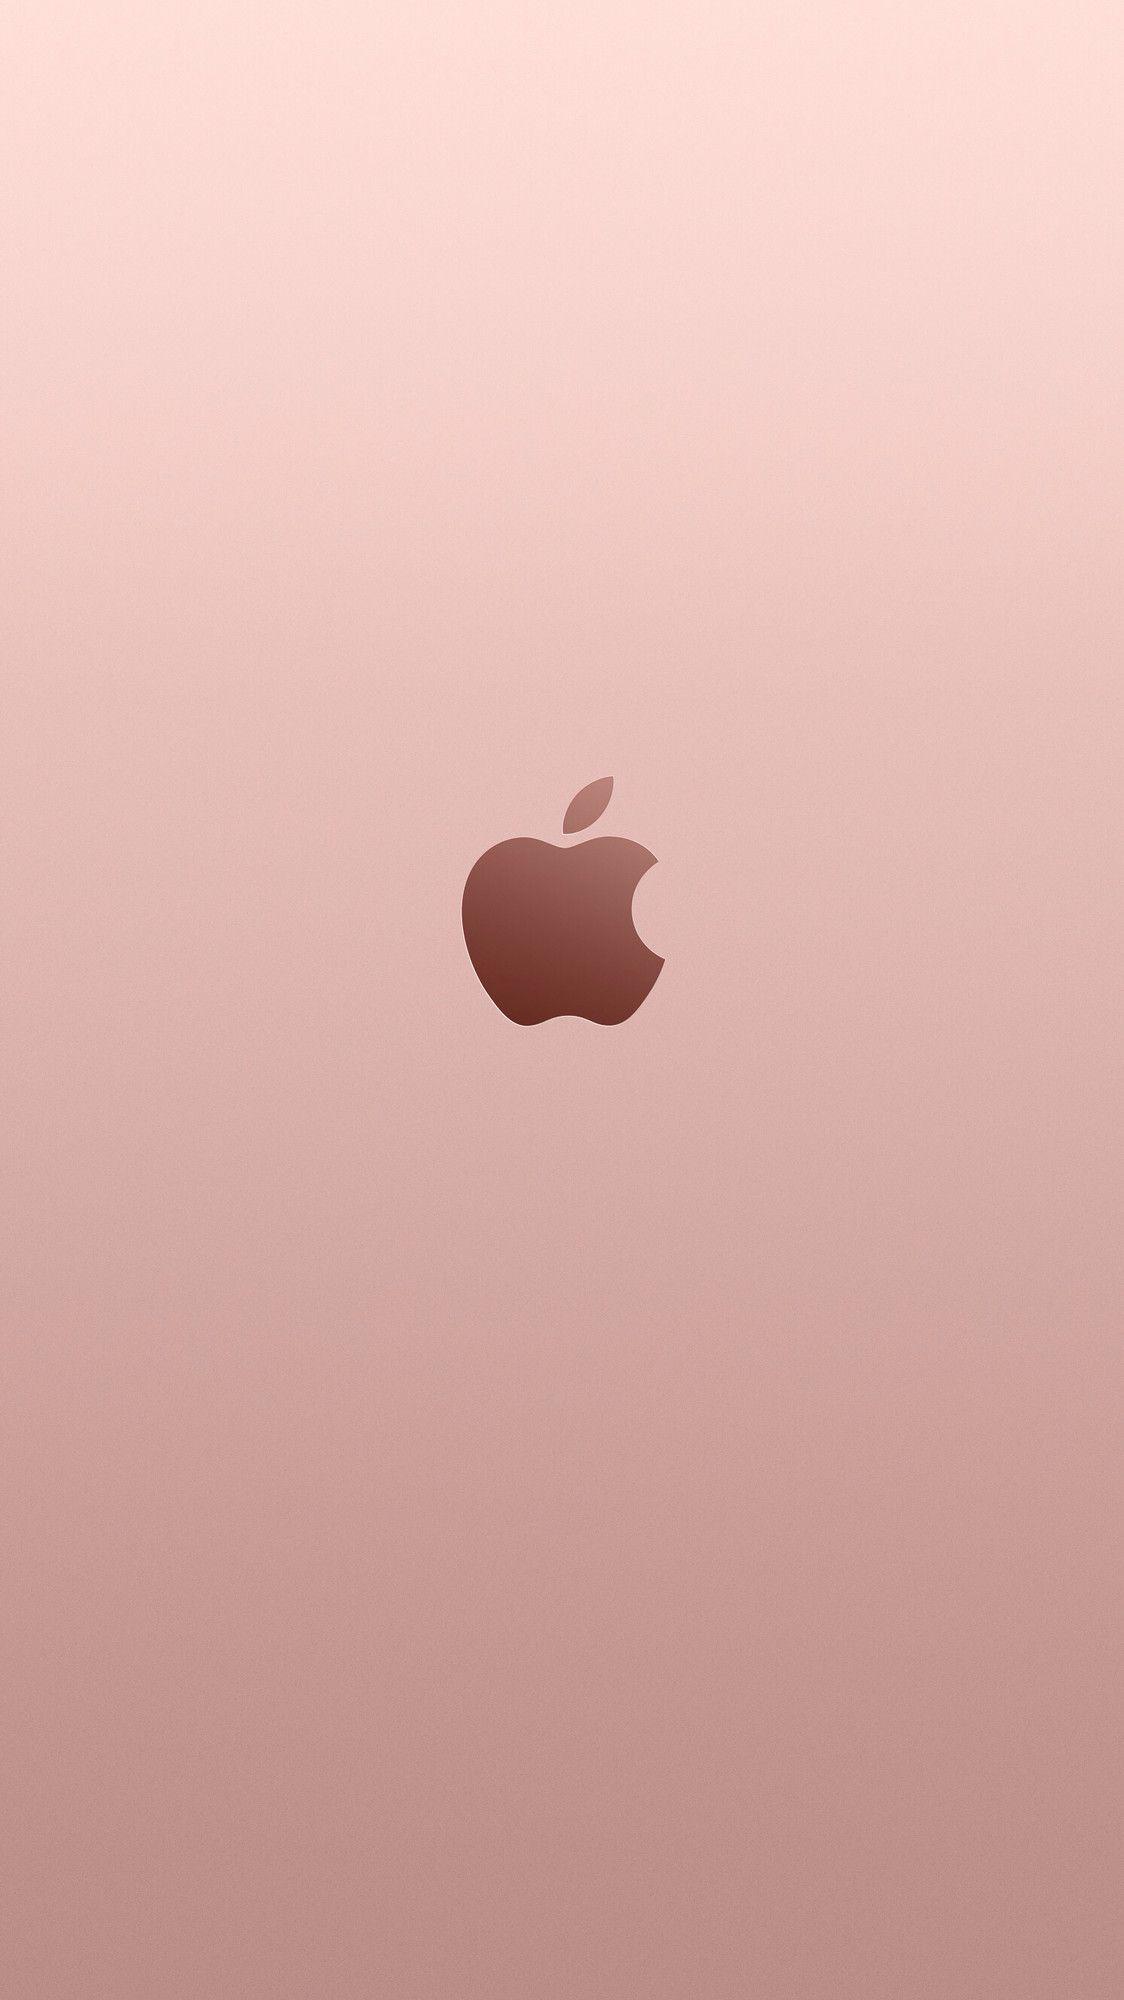 Bakgrund Celular Snoopy Iphone Tapet Applewallpaperiphone Socialmania Apple Logo Wallpaper Iphone Rose Gold Wallpaper Apple Wallpaper